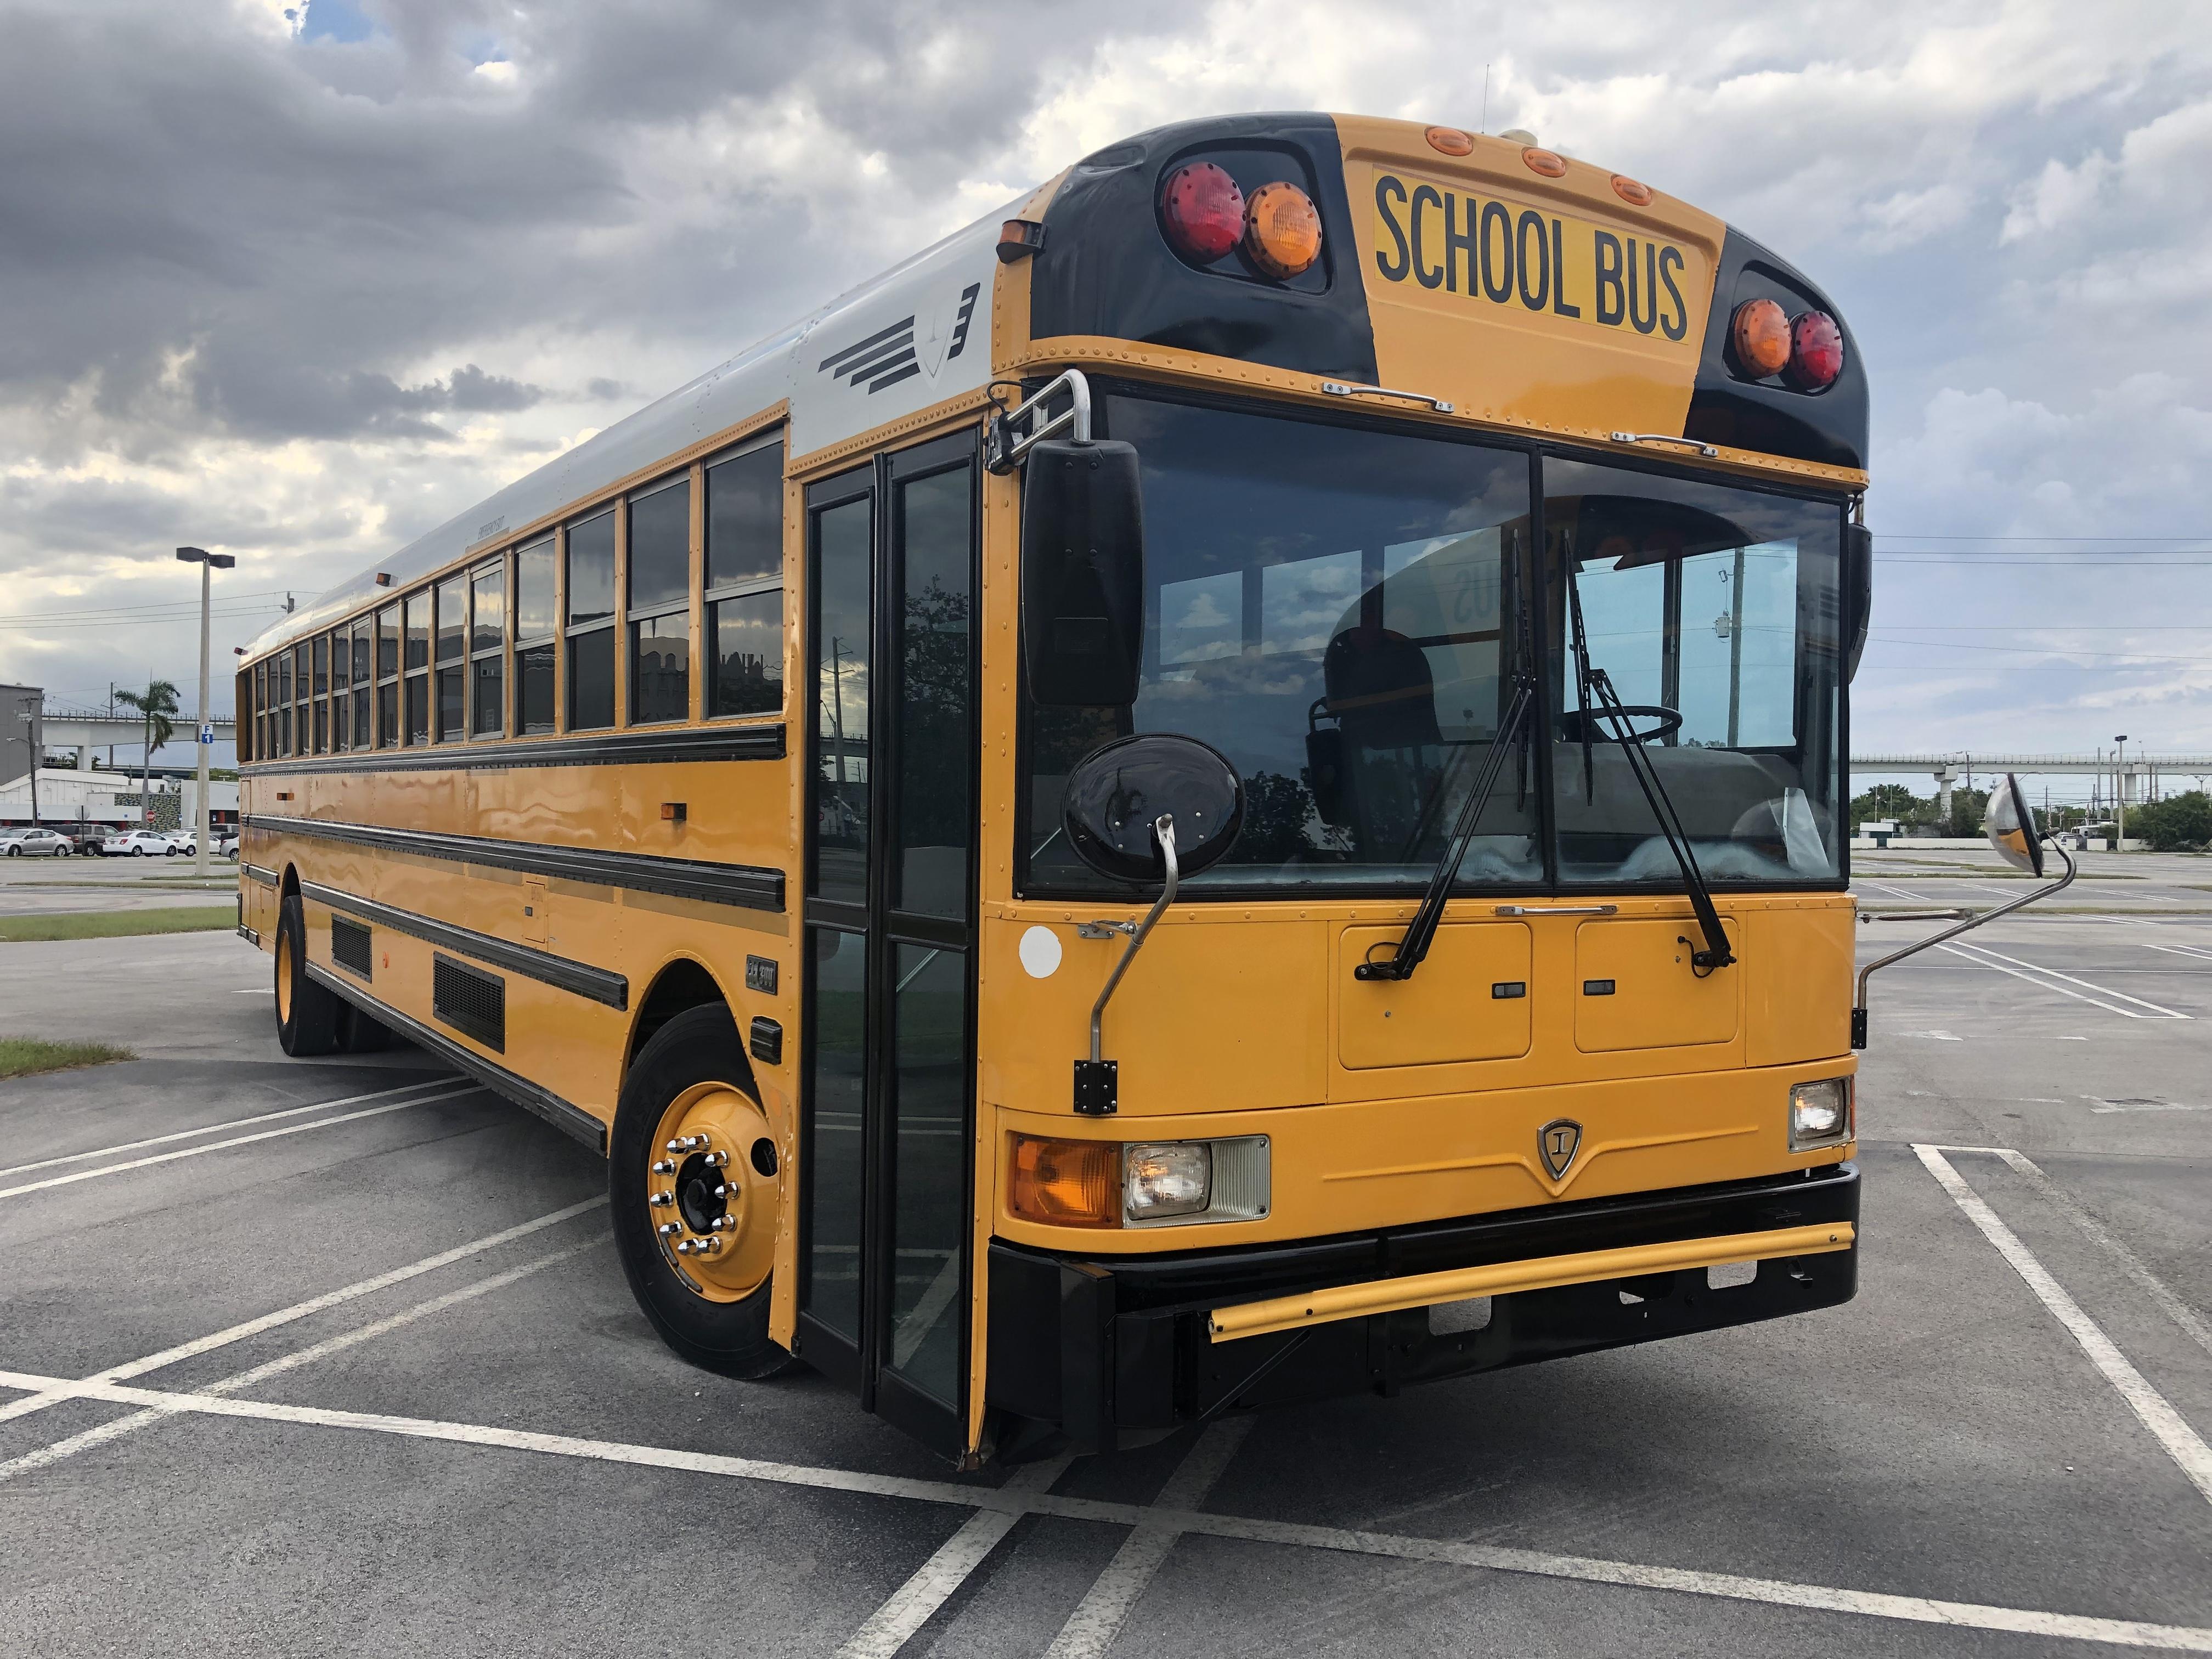 Miami Bus Deals – South Florida's #1 School Bus Dealer